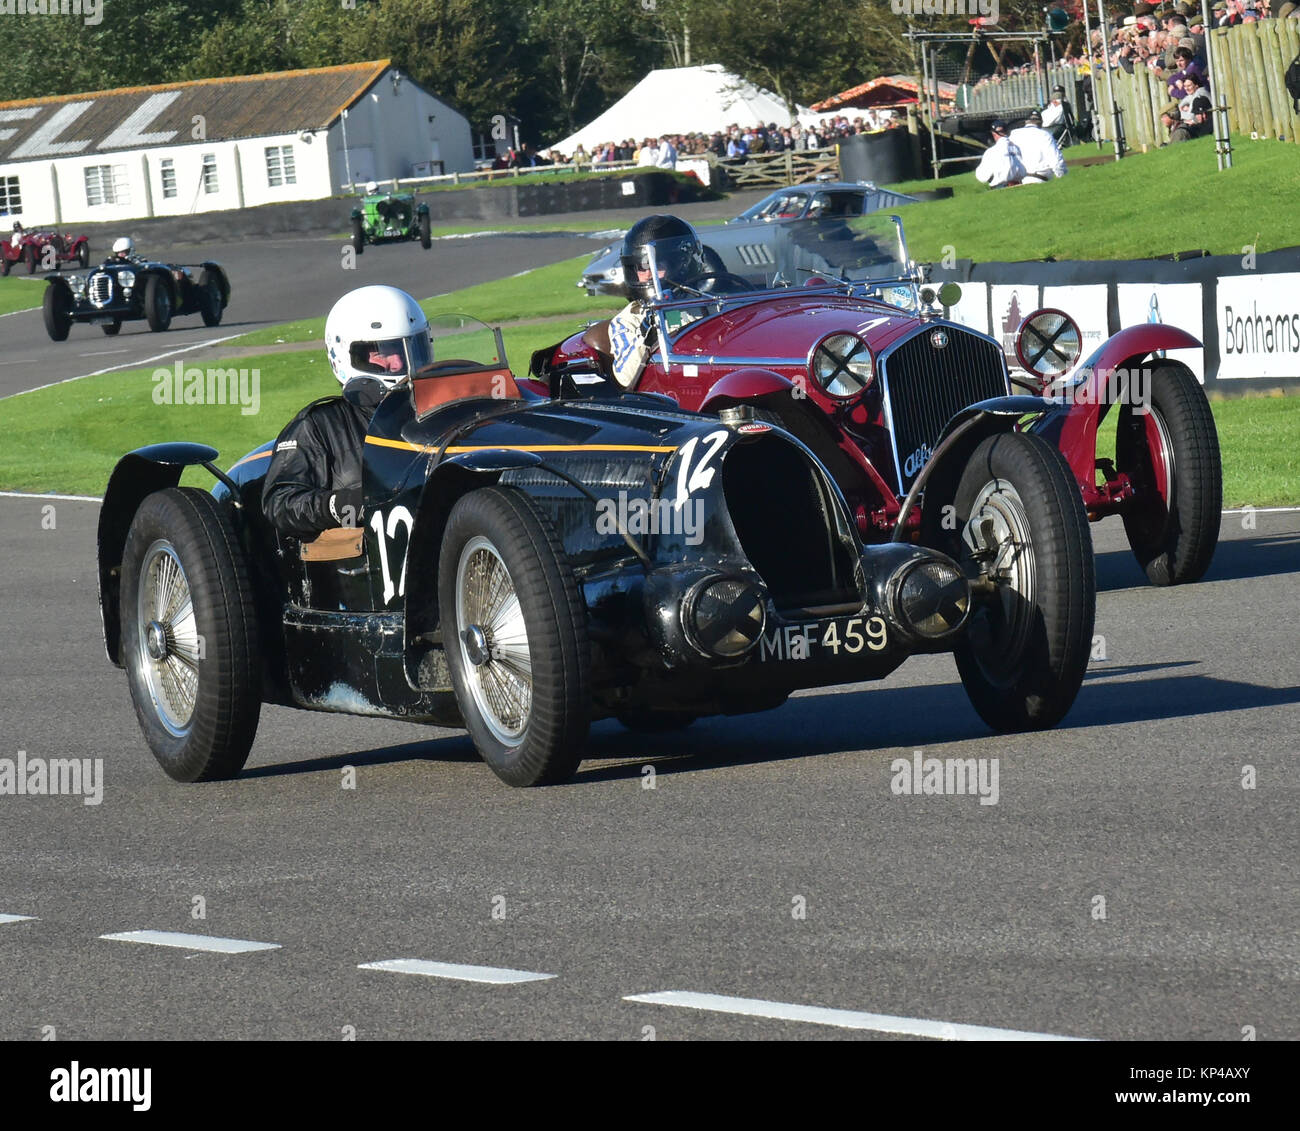 Tim Dutton, Bugatti Type 59, MFF 459, Martin Halusa, Alfa